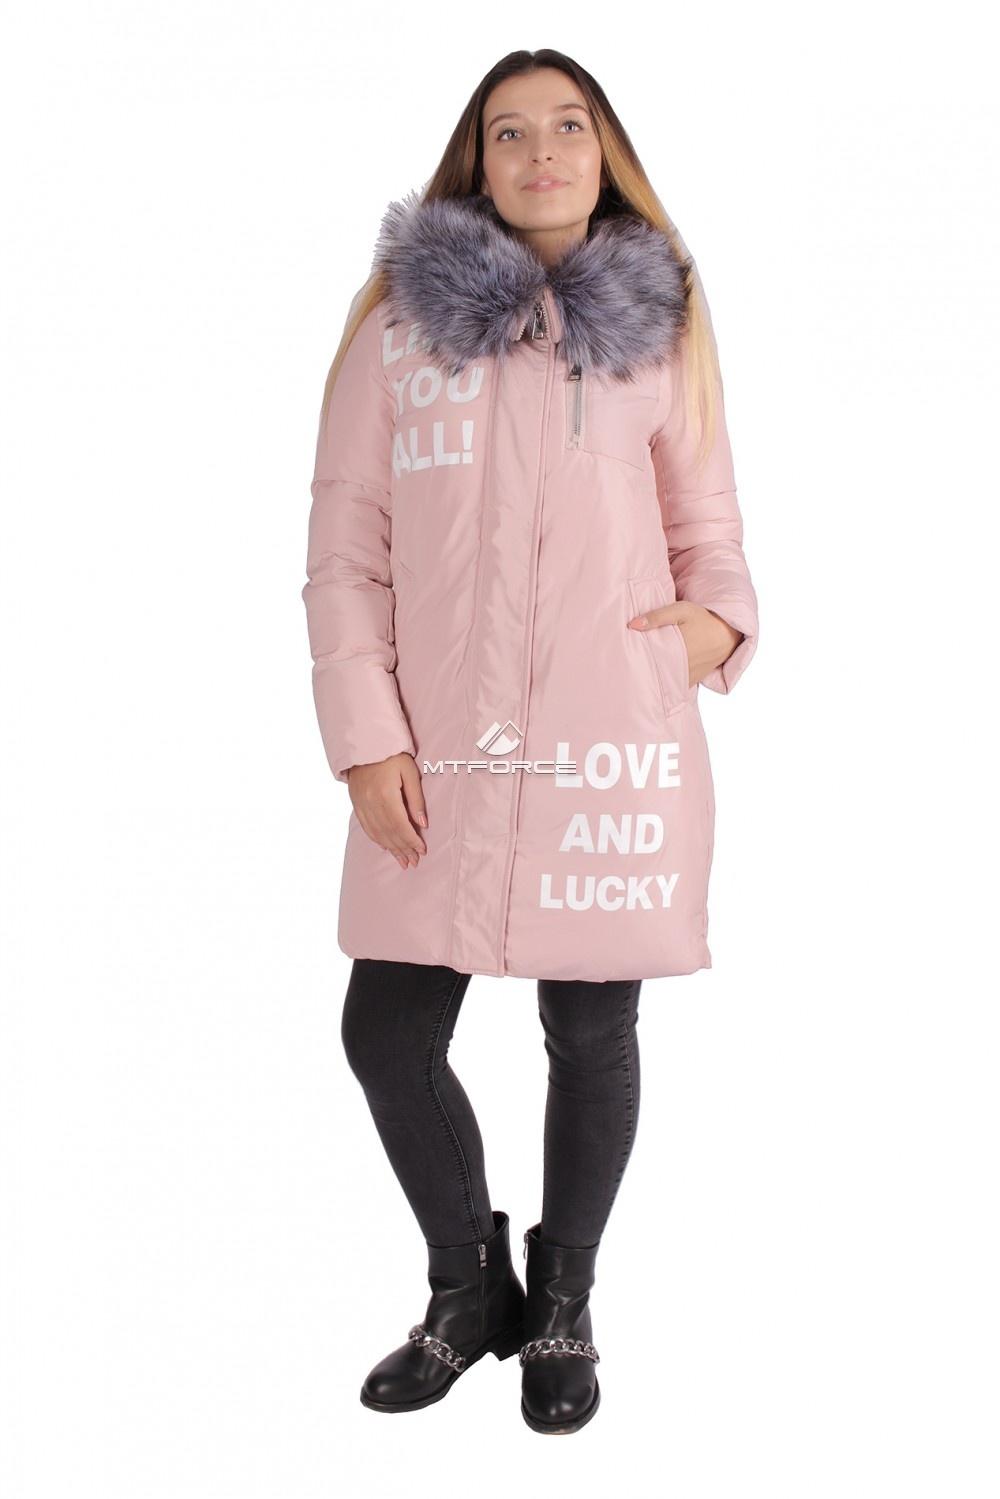 Купить                                  оптом Пуховик ТРЕНД женский зимний розового цвета 16085R в Новосибирске